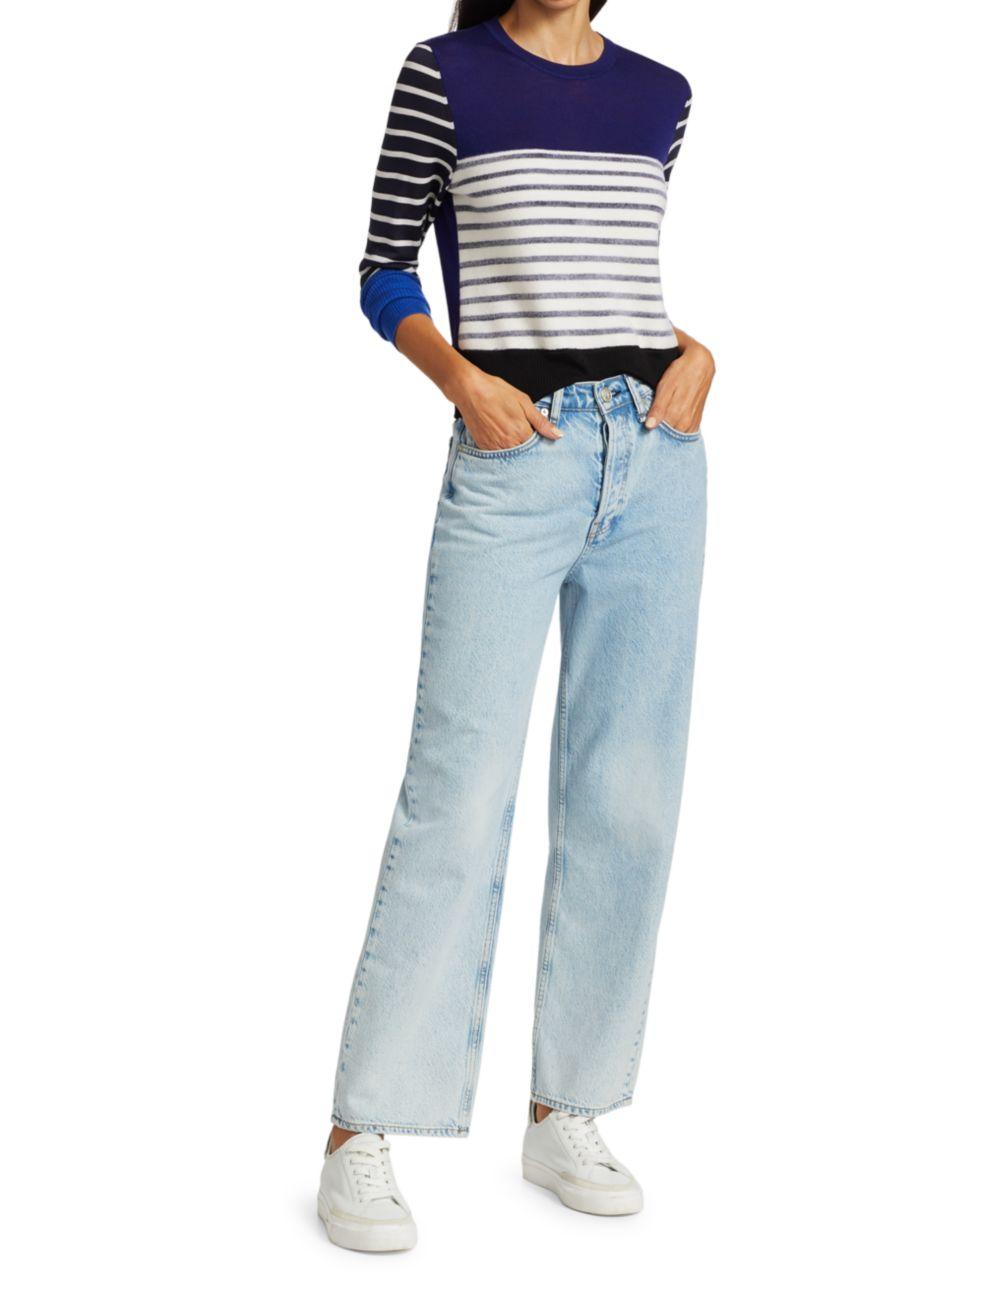 Rag & Bone Marissa Contrast Stripe Sweater | SaksFifthAvenue